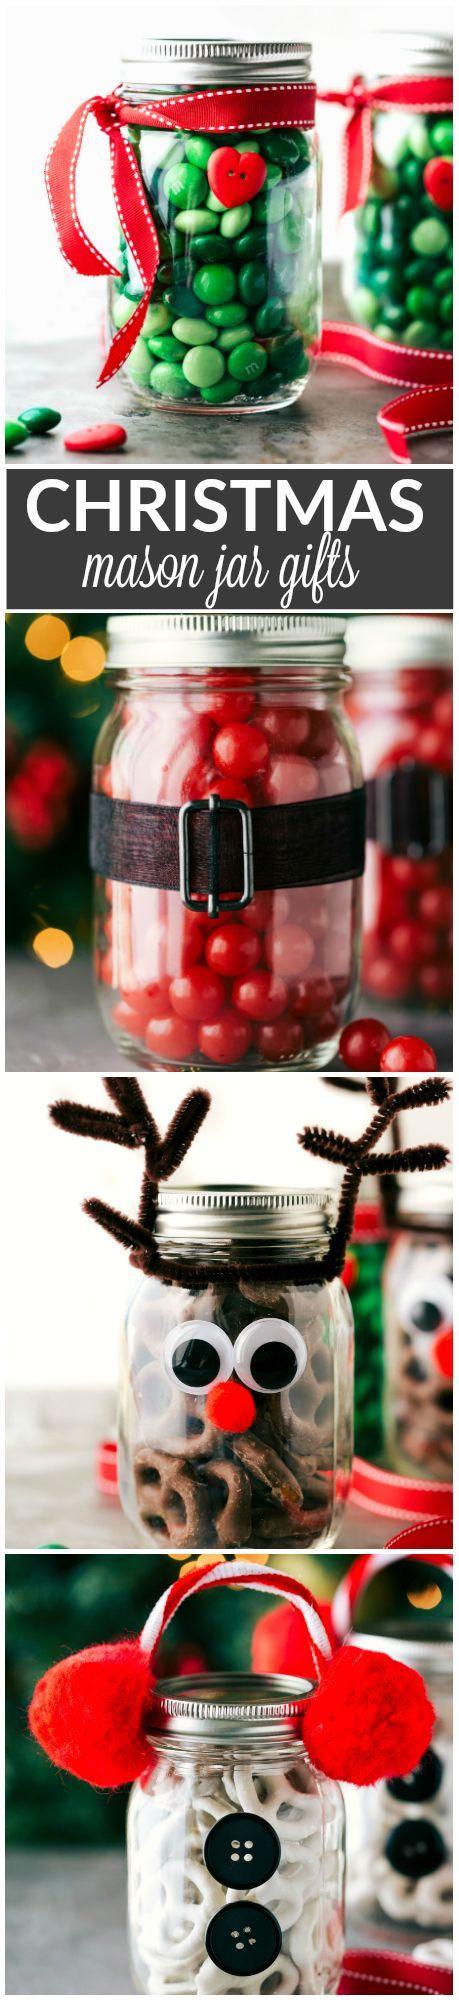 Four easy and creative mason jar CHRISTMAS treat gift ideas. A grinch jar, santa jar, reindeer jar, and snowman jar! Via http://chelseasmessyapron.com